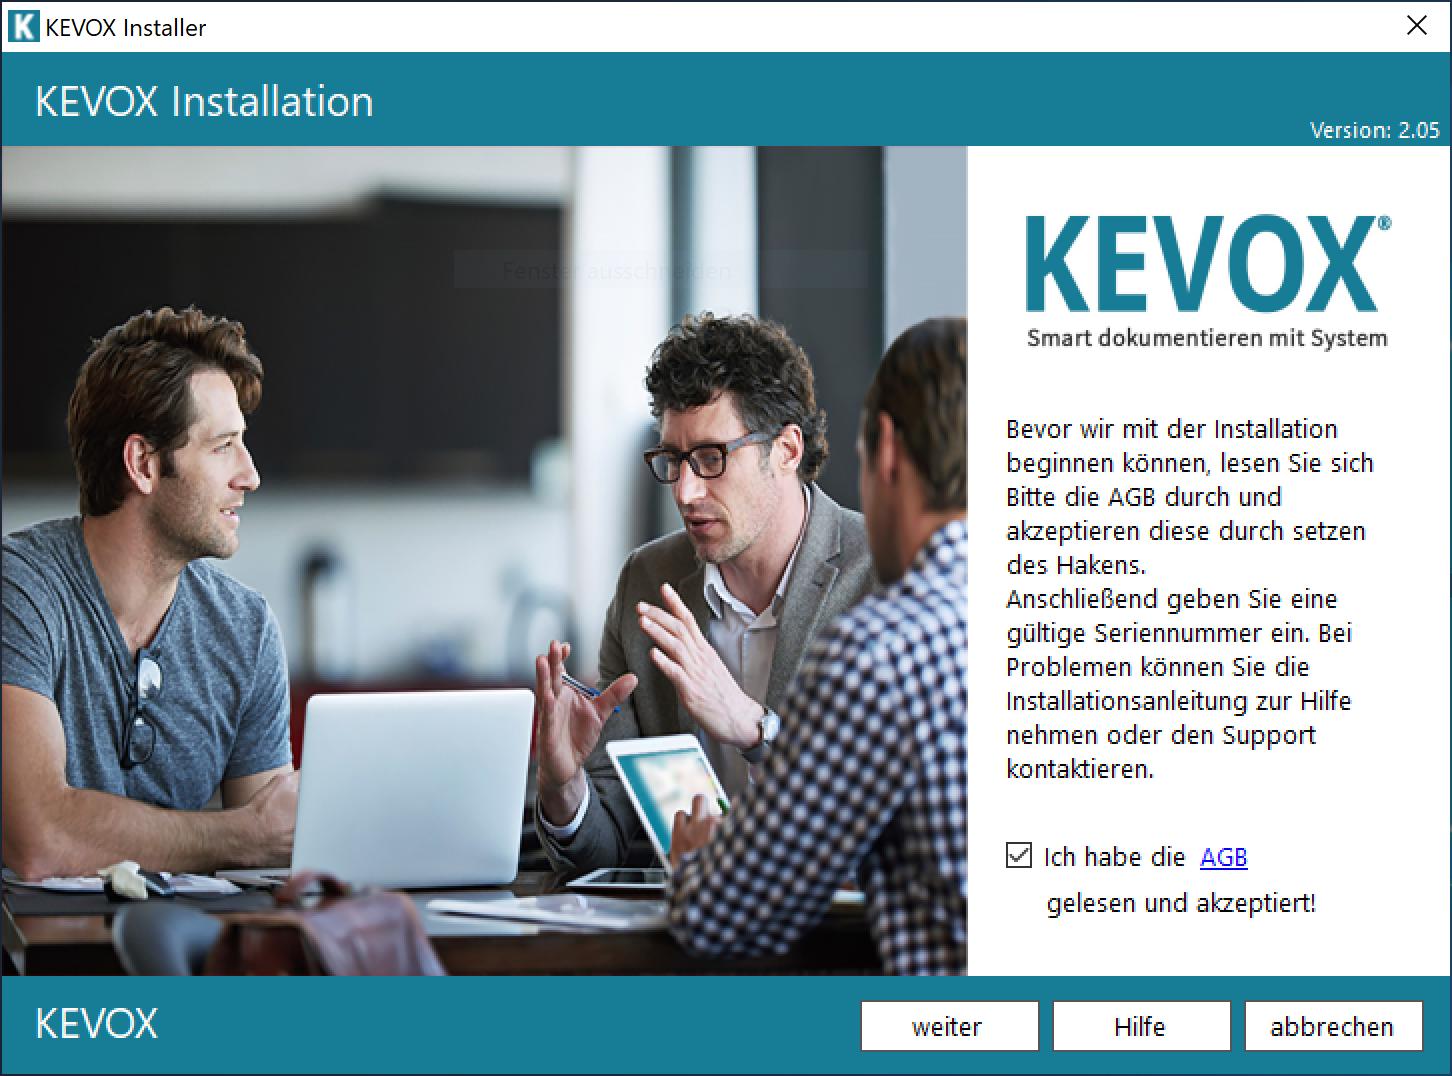 KEVOX-Installation-start-dokumentieren